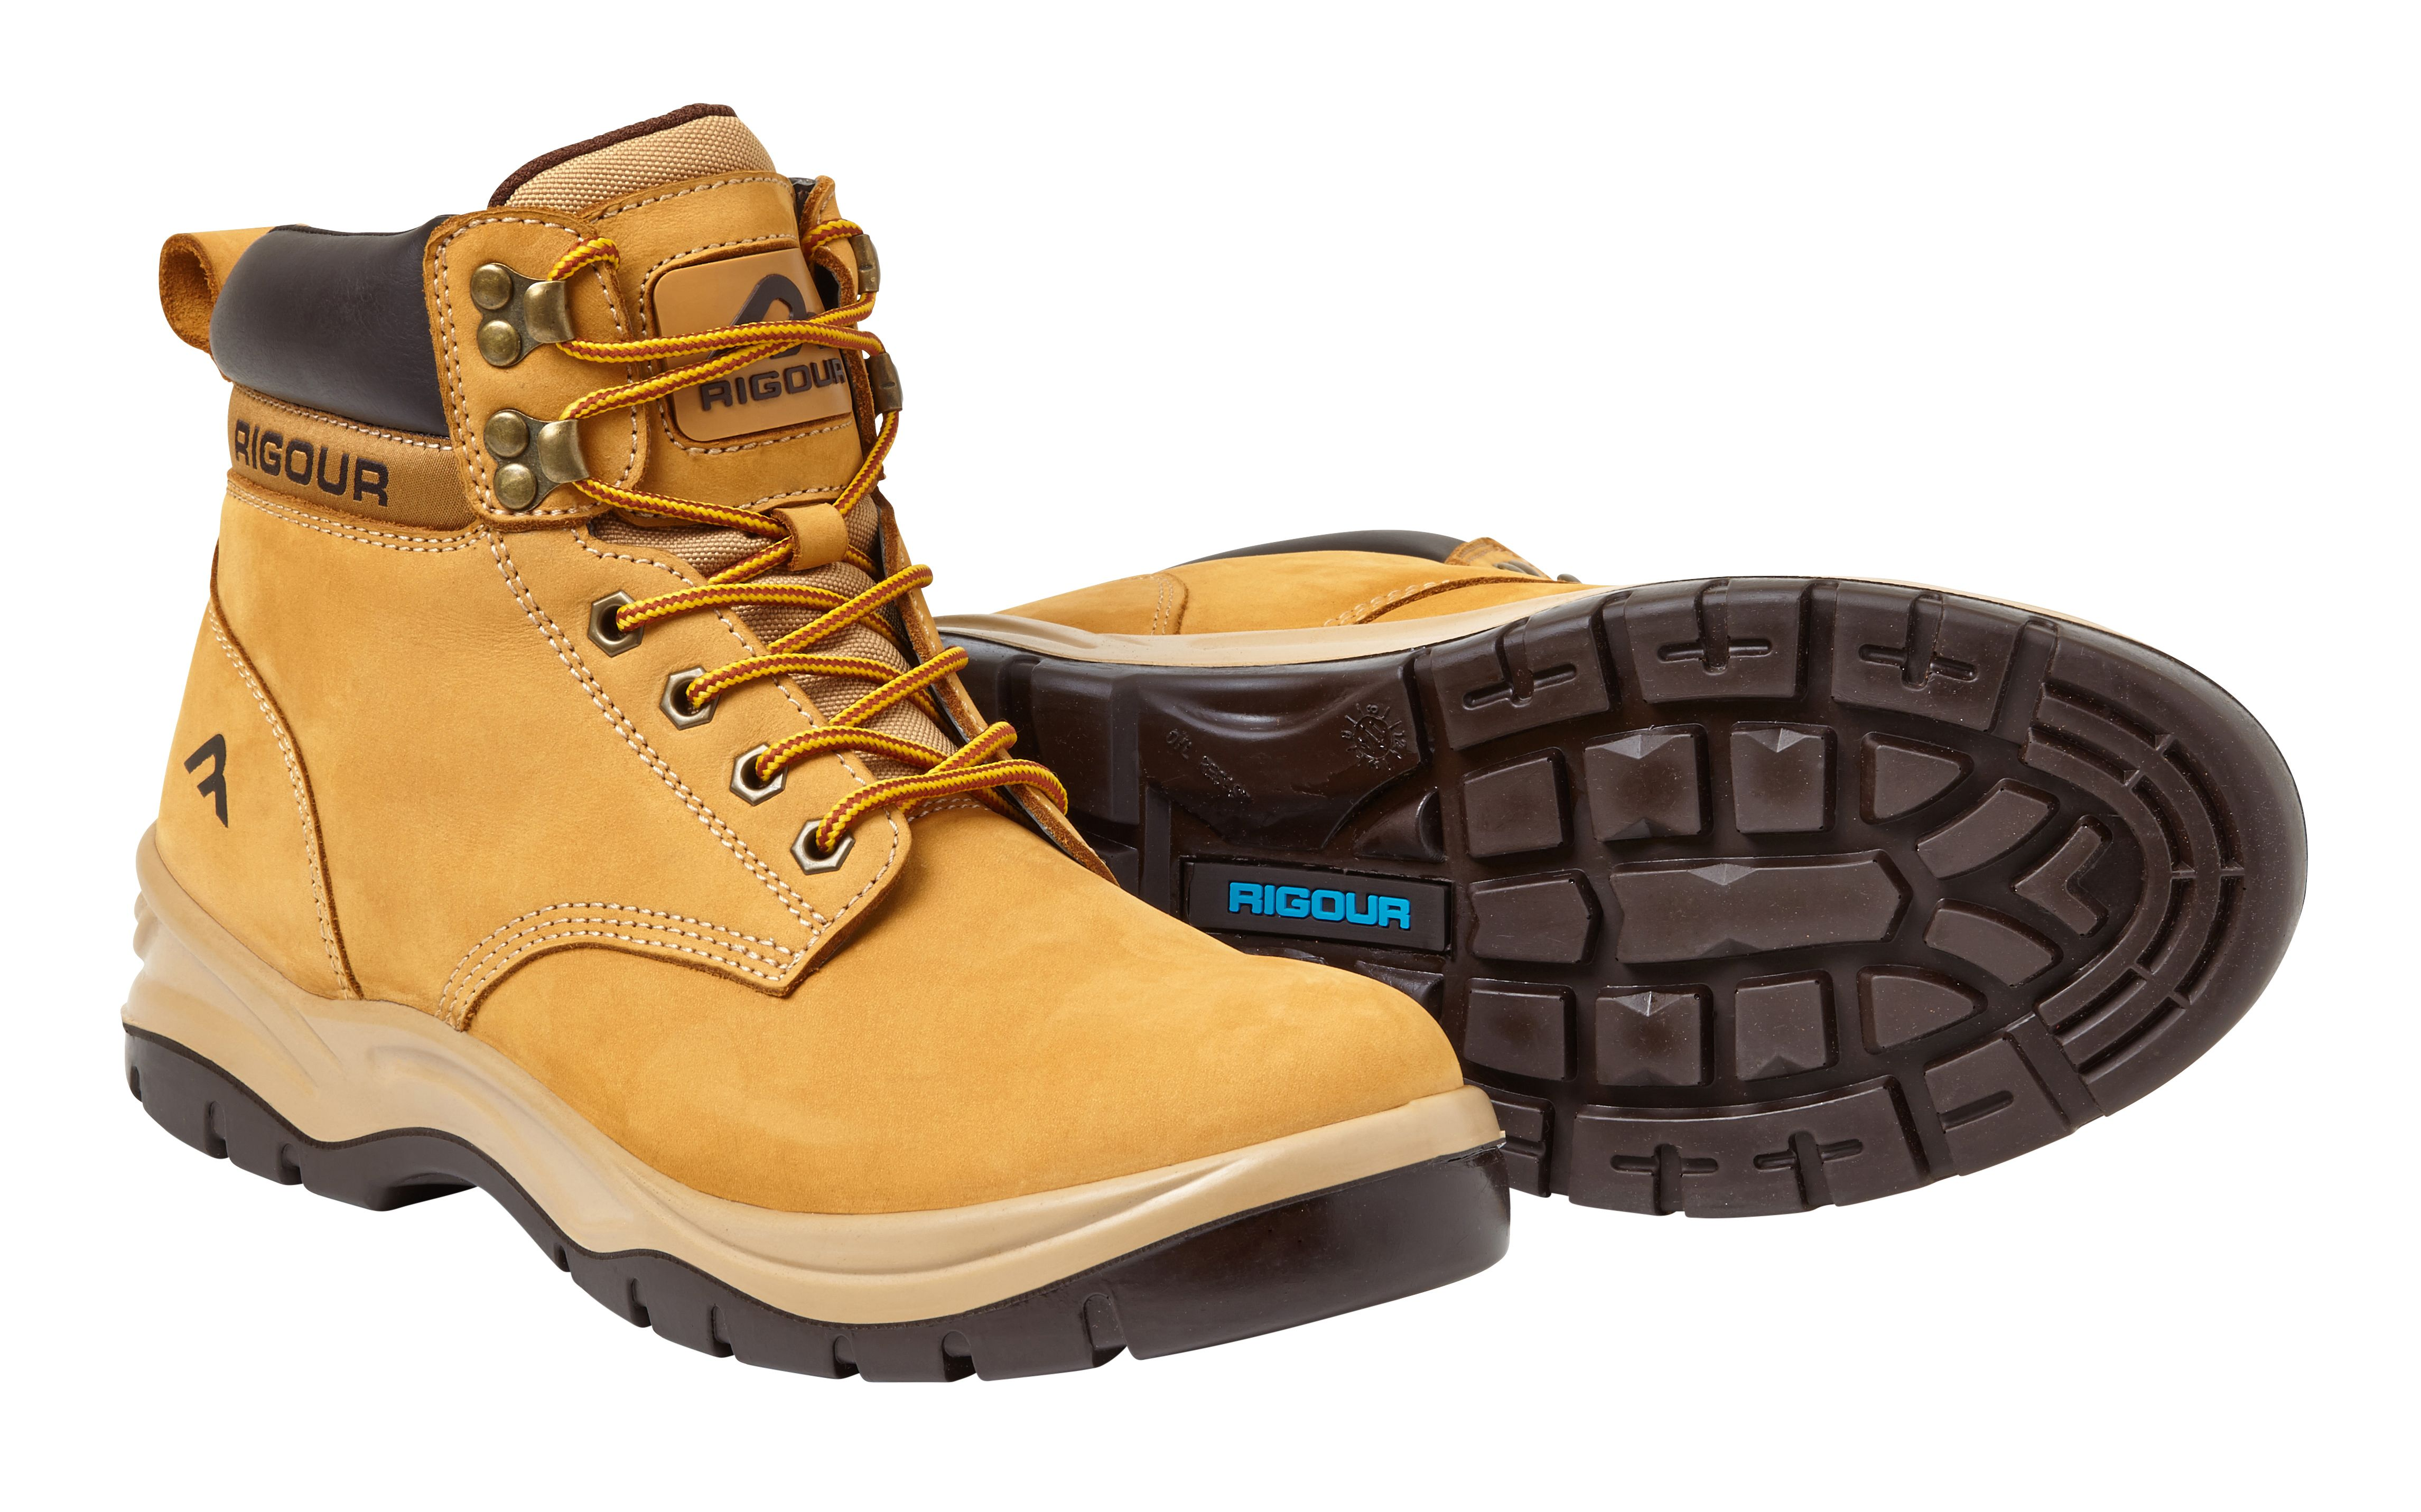 Rigour Wheat Safety Work Boots, Size 12